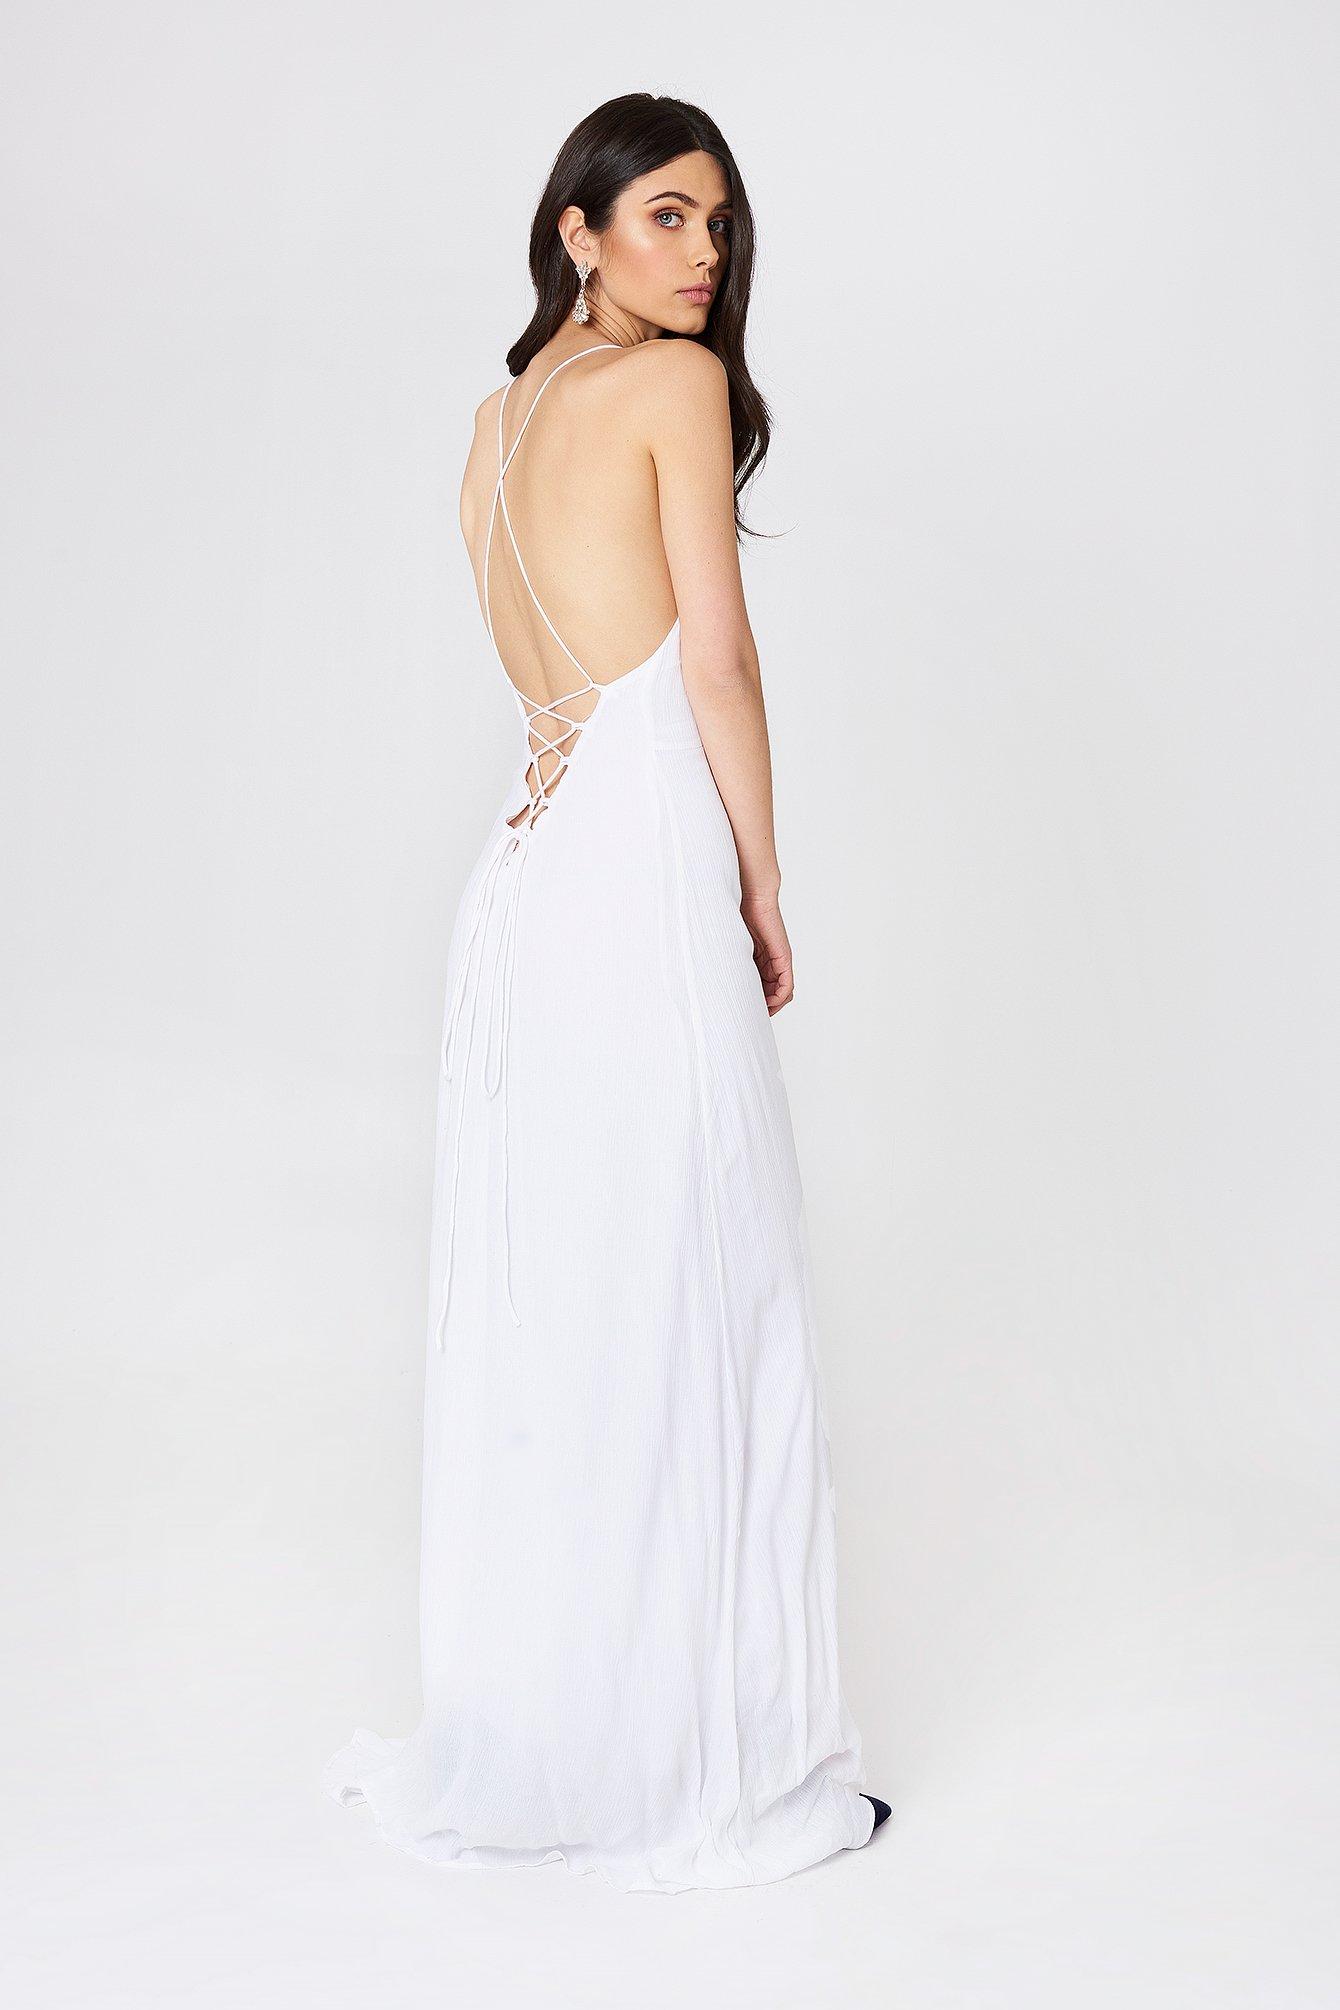 GIRL & THE SUN LUNA TIE BACK MAXI DRESS - WHITE